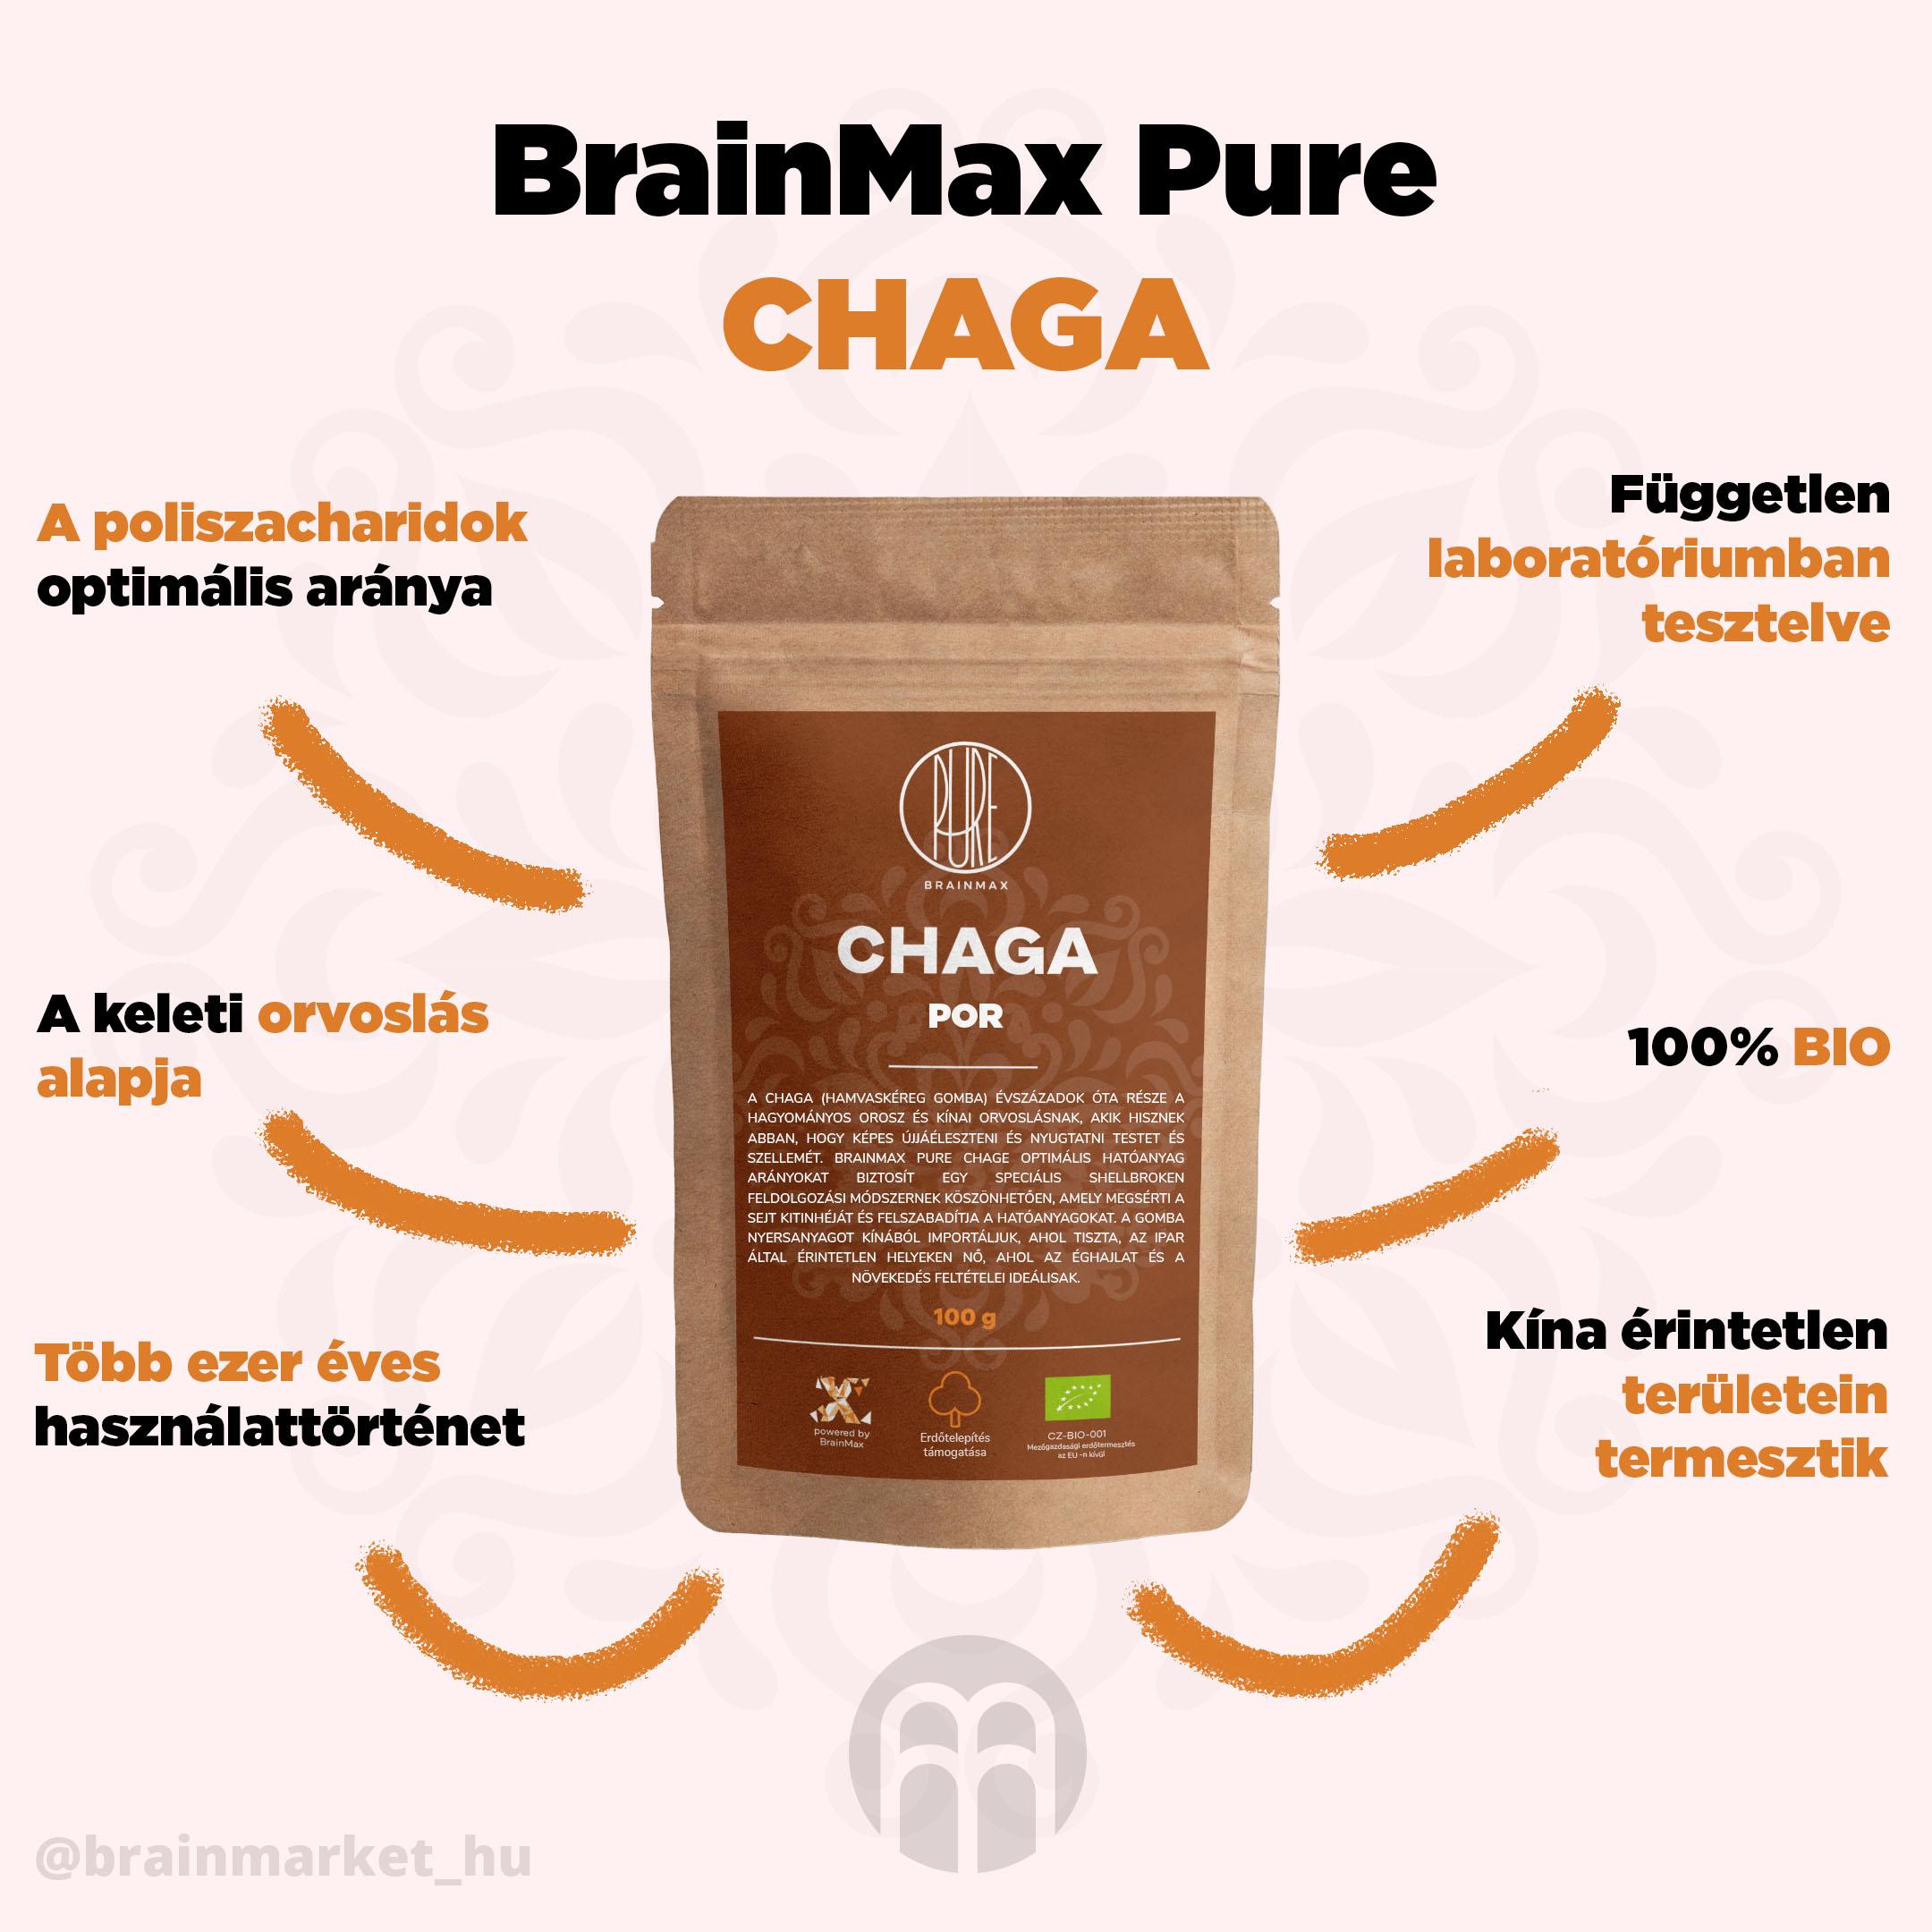 CHAGA_prasek_infografika_brainmarket_hu